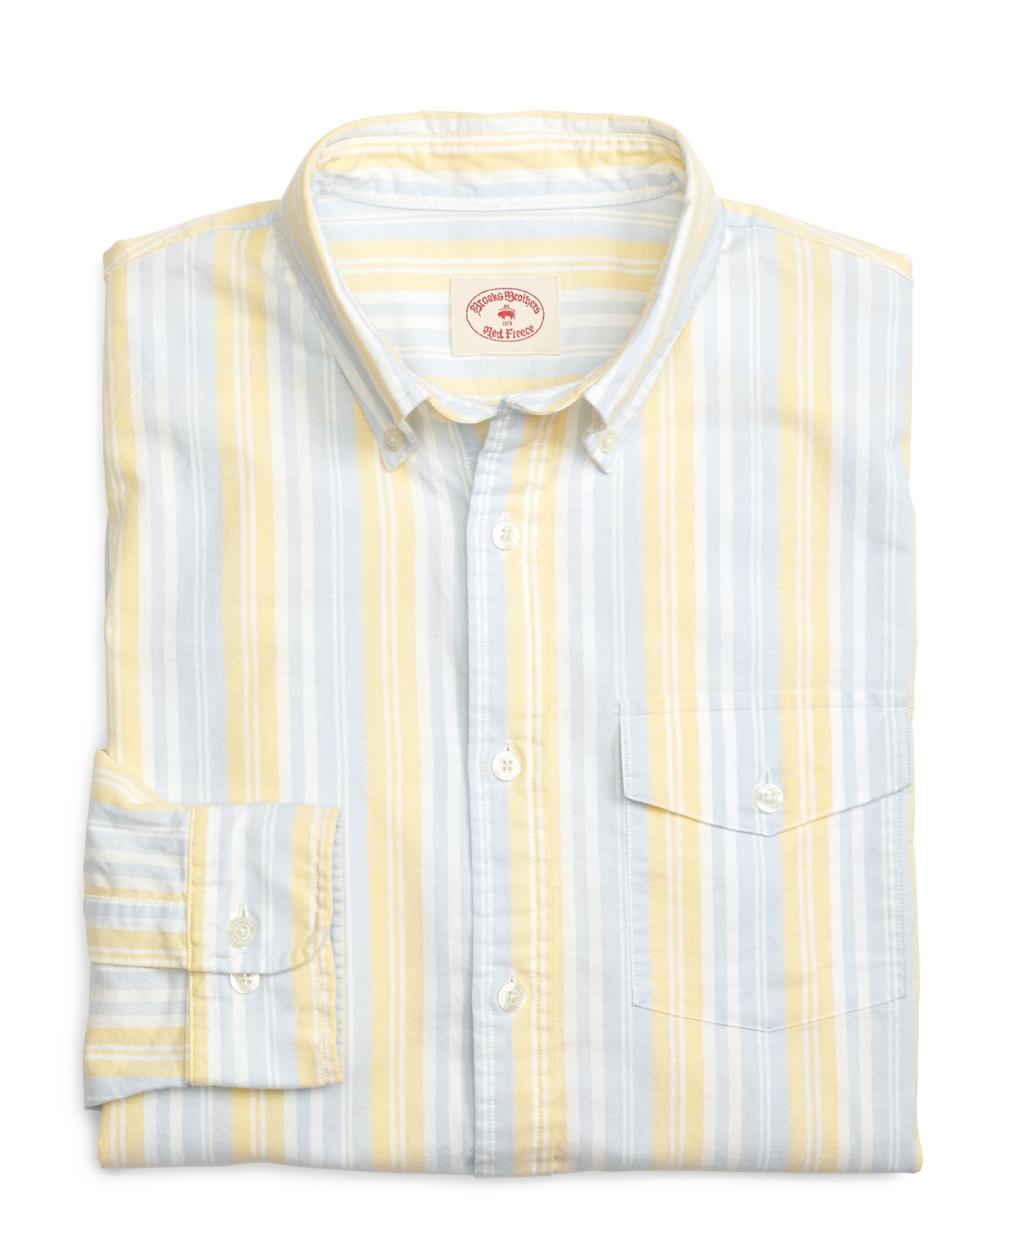 Lyst brooks brothers supima cotton stripe sport shirt for Brooks brothers sports shirts